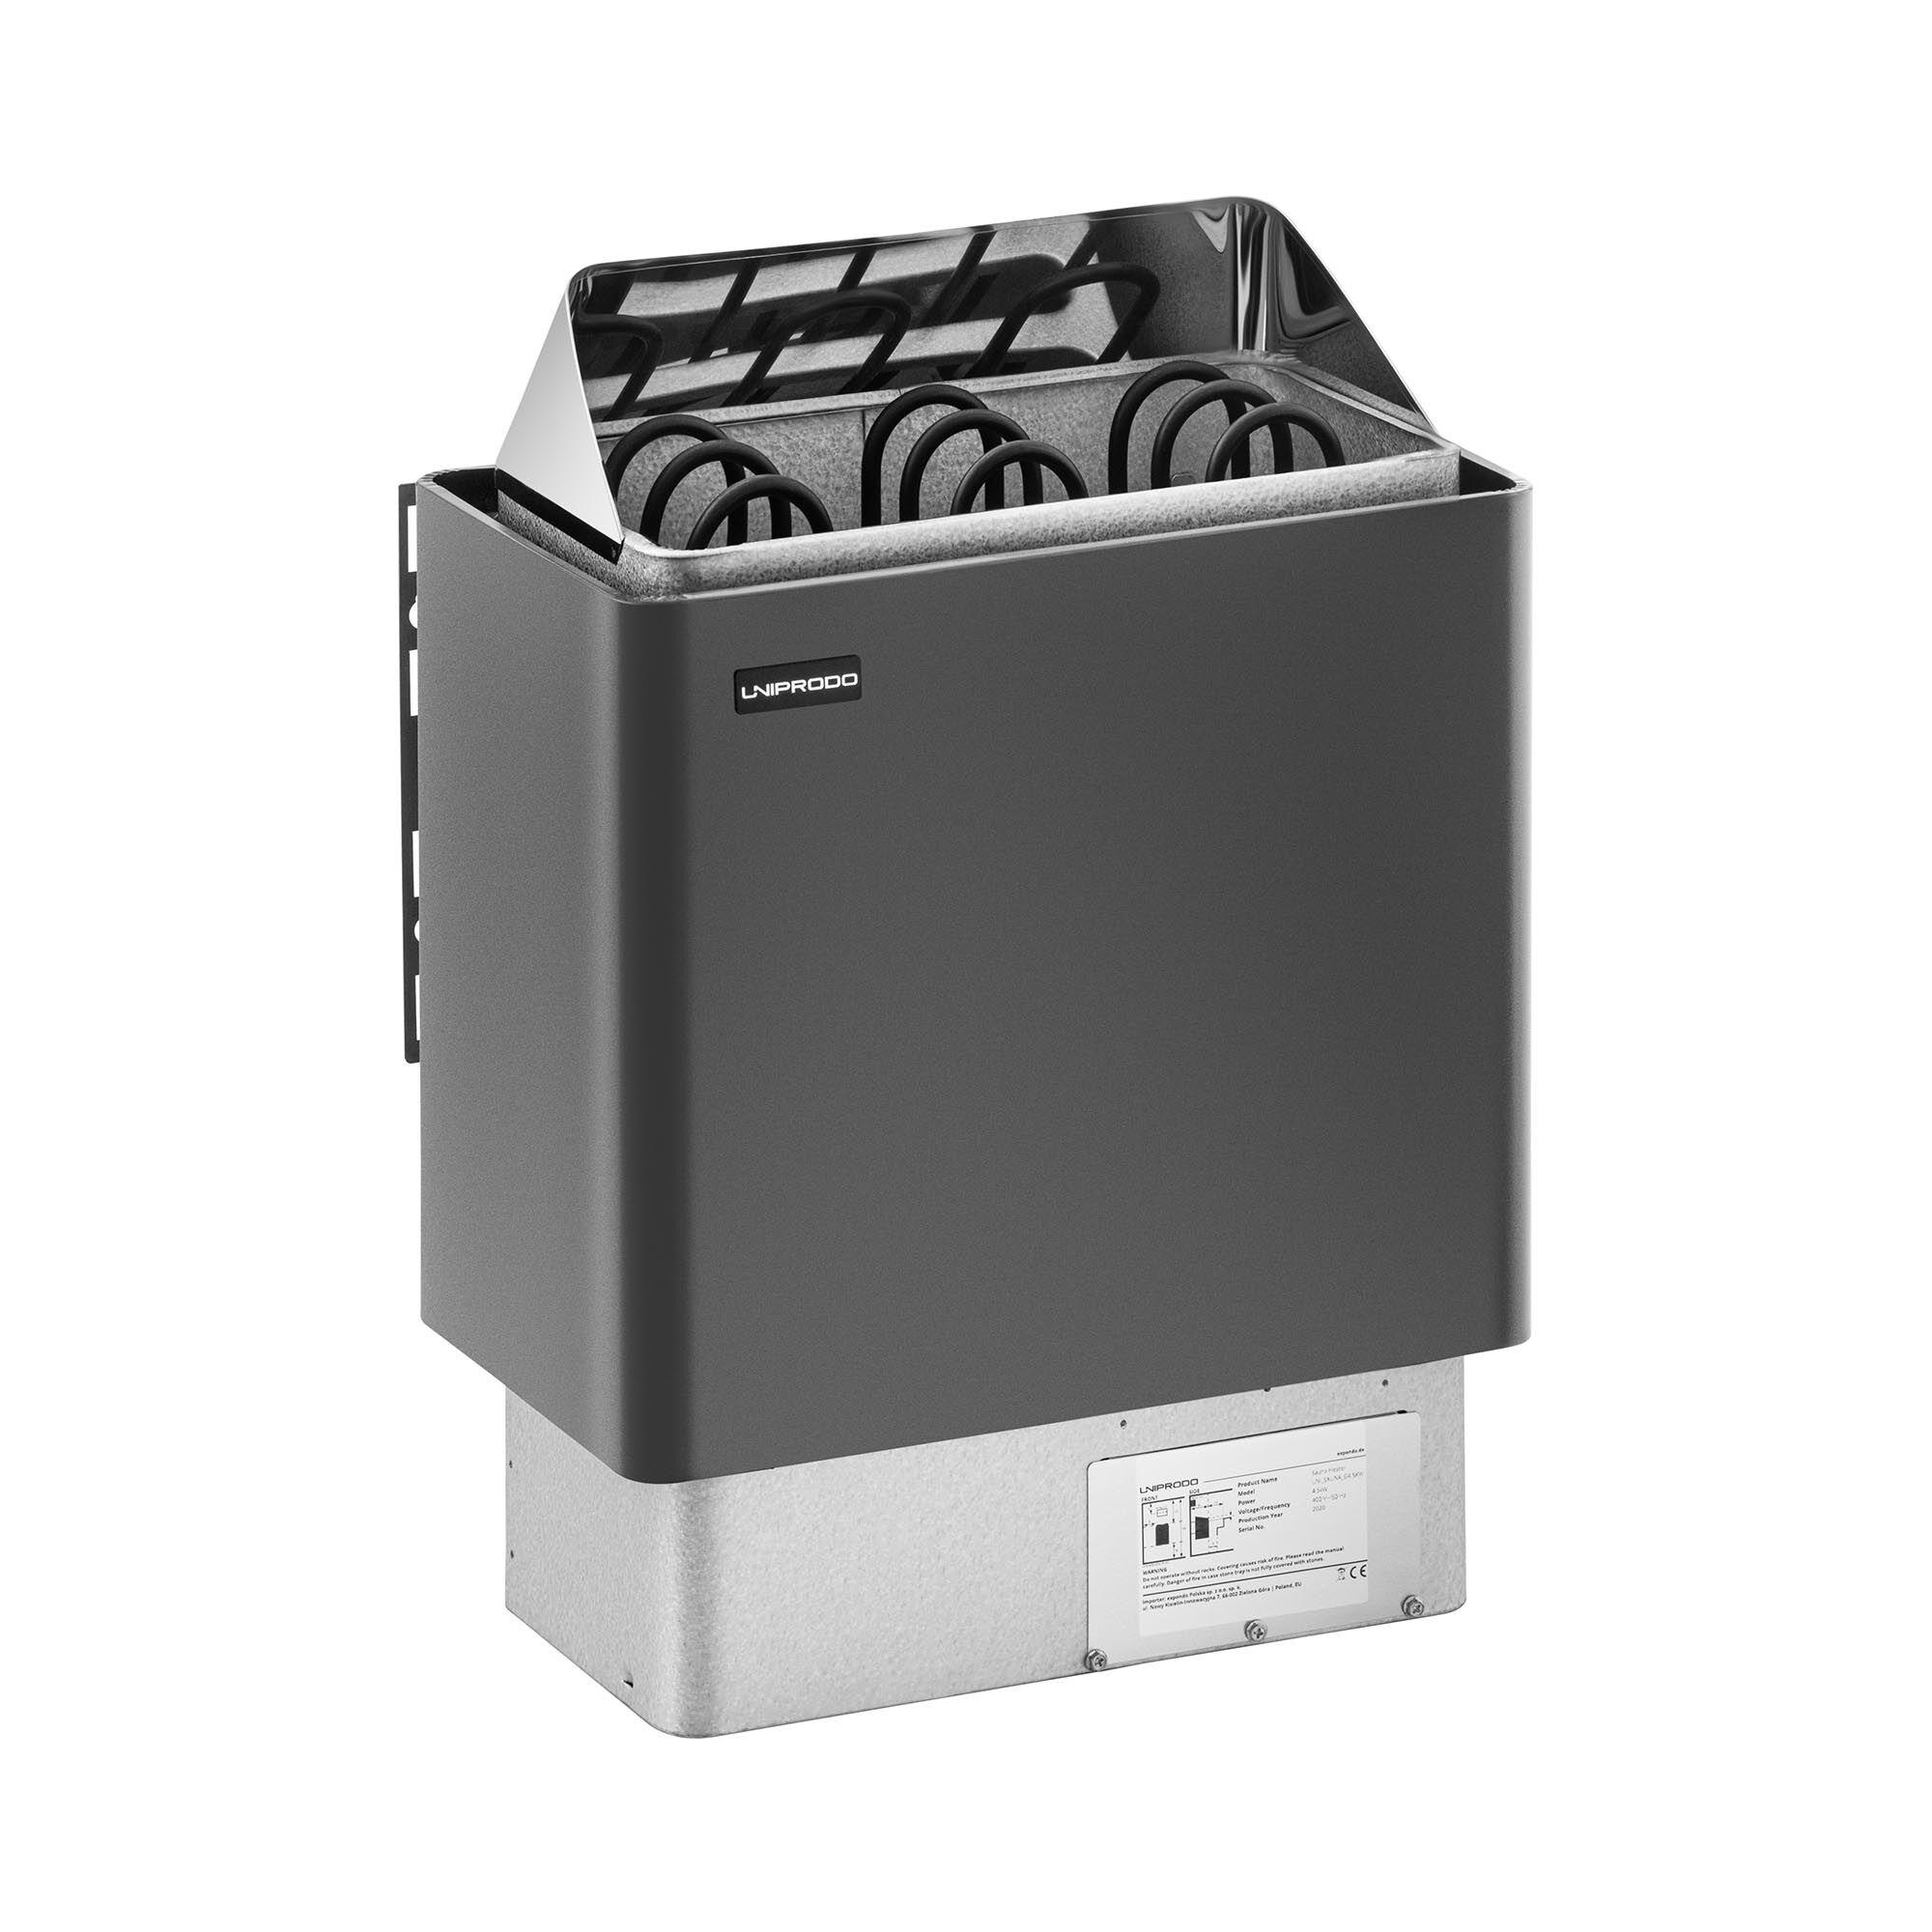 Uniprodo Poêle pour sauna - 4,5 kW - 30 à 110 °C UNI_SAUNA_G4.5KW